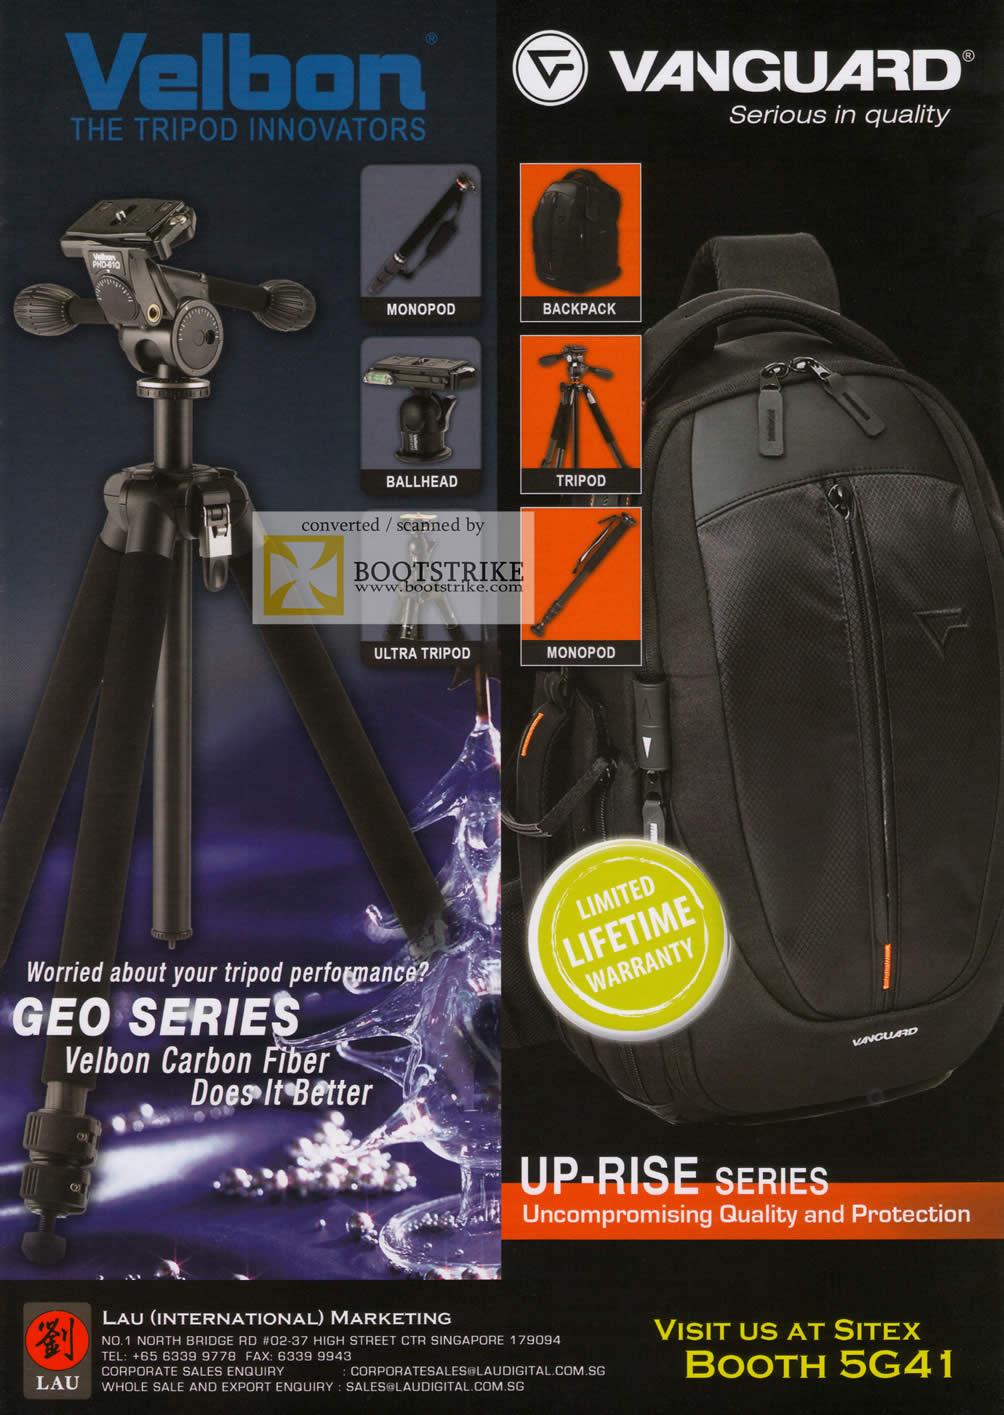 Sitex 2009 price list image brochure of Vanguard Velbon Monopod Backpack Ballhead Tripod